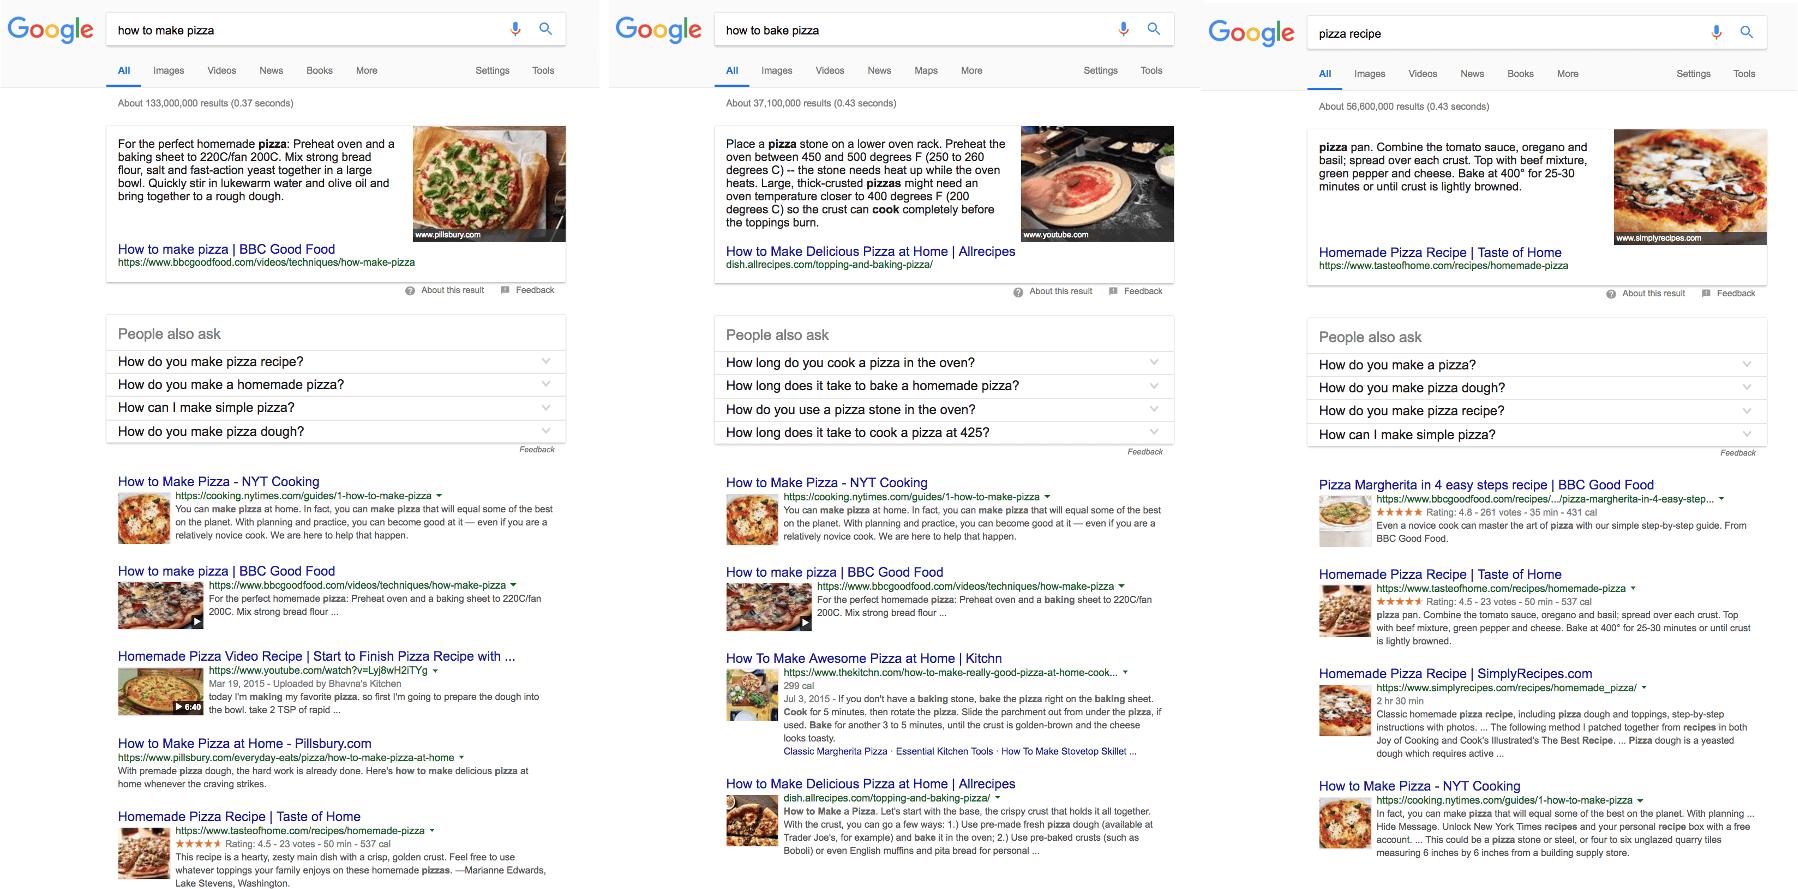 rankbrain similar keyword serp results